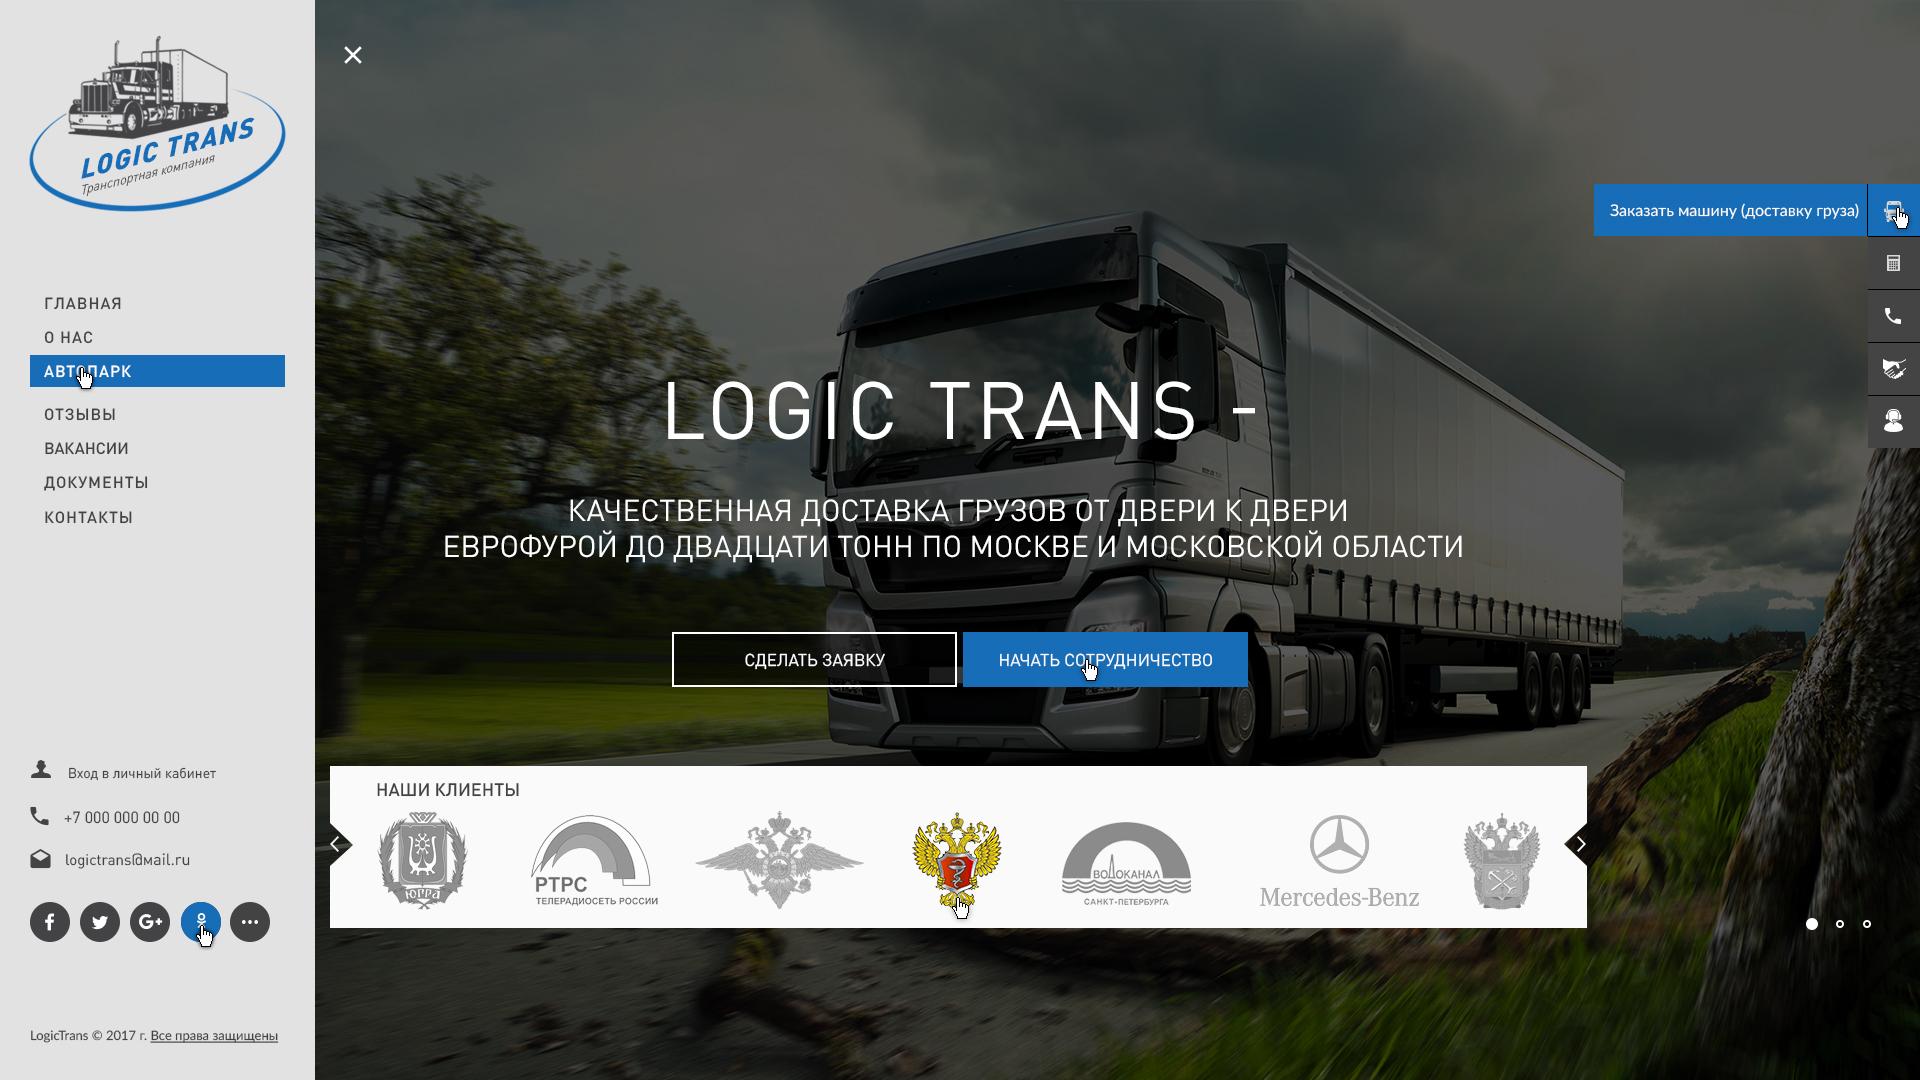 Дизайн сайта транспортно-экспедиторской компании ЛогикТранс фото f_0105a45be79ccbf4.jpg